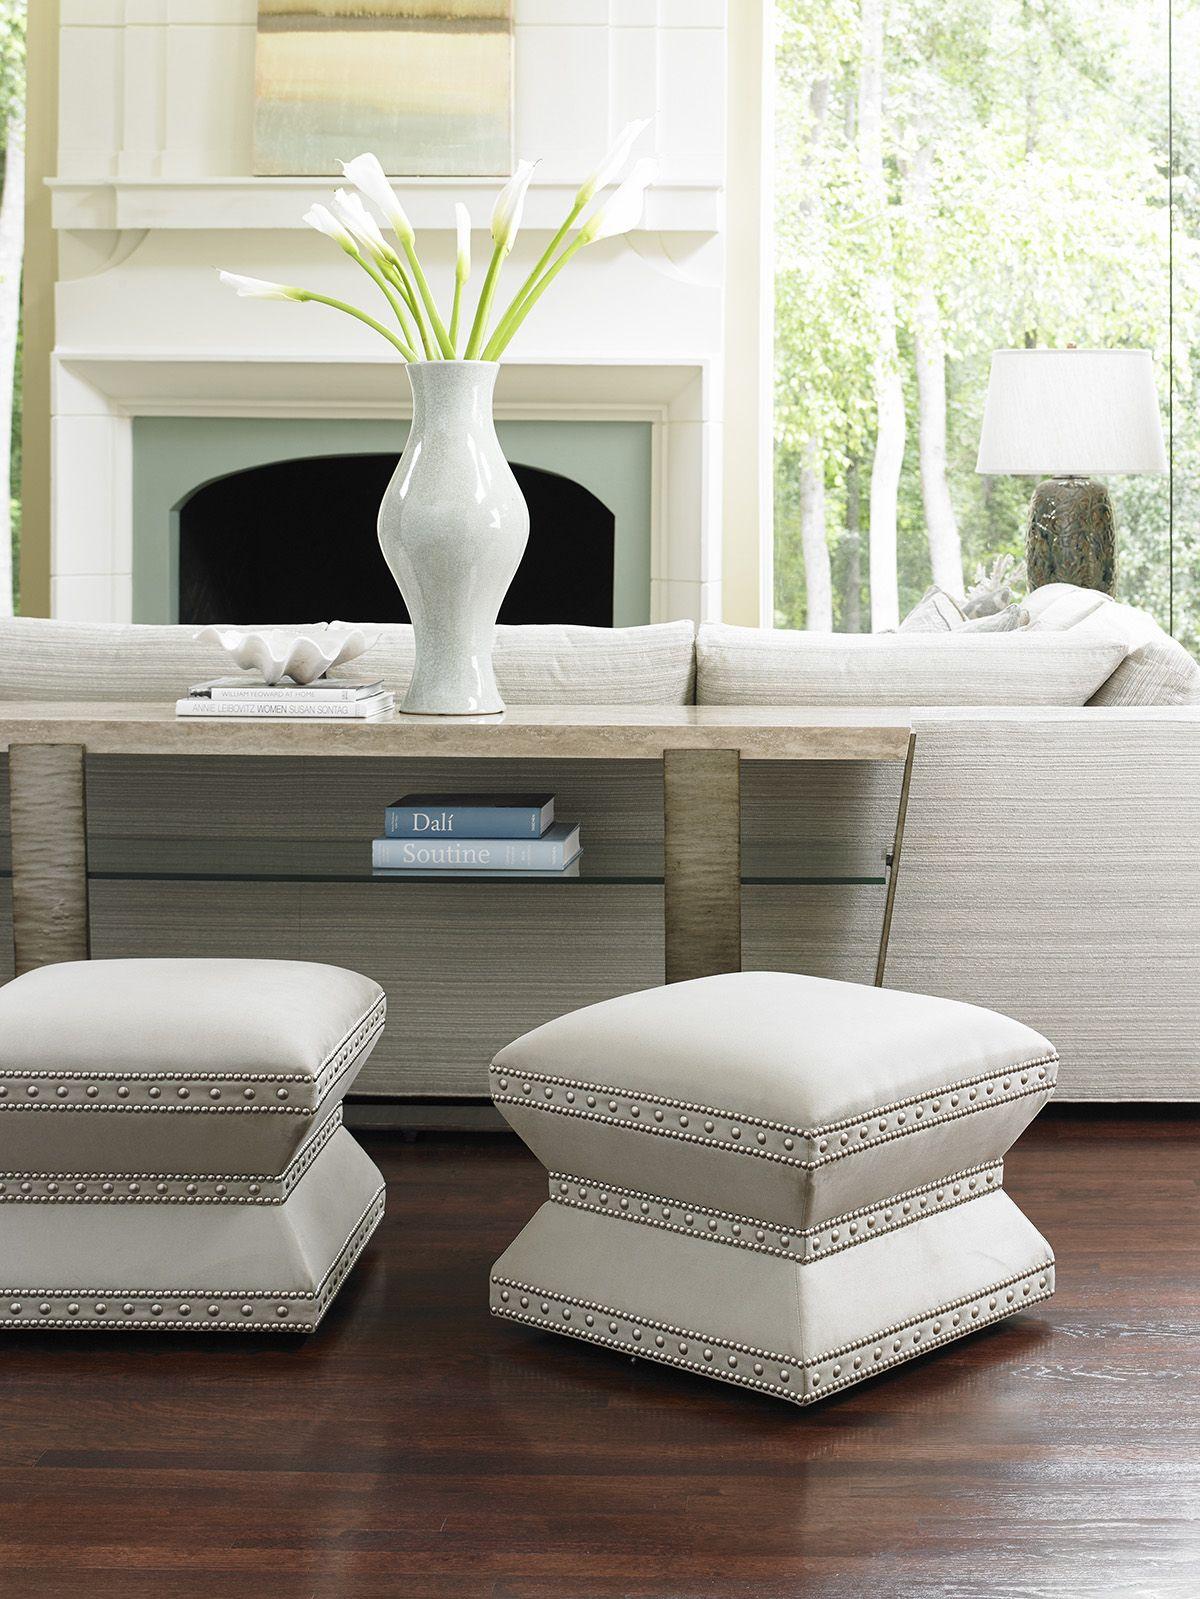 Laurel Canyon Wheatley Ottoman  Lexington Home Brands  Stool Extraordinary Living Room Ottoman Decorating Inspiration